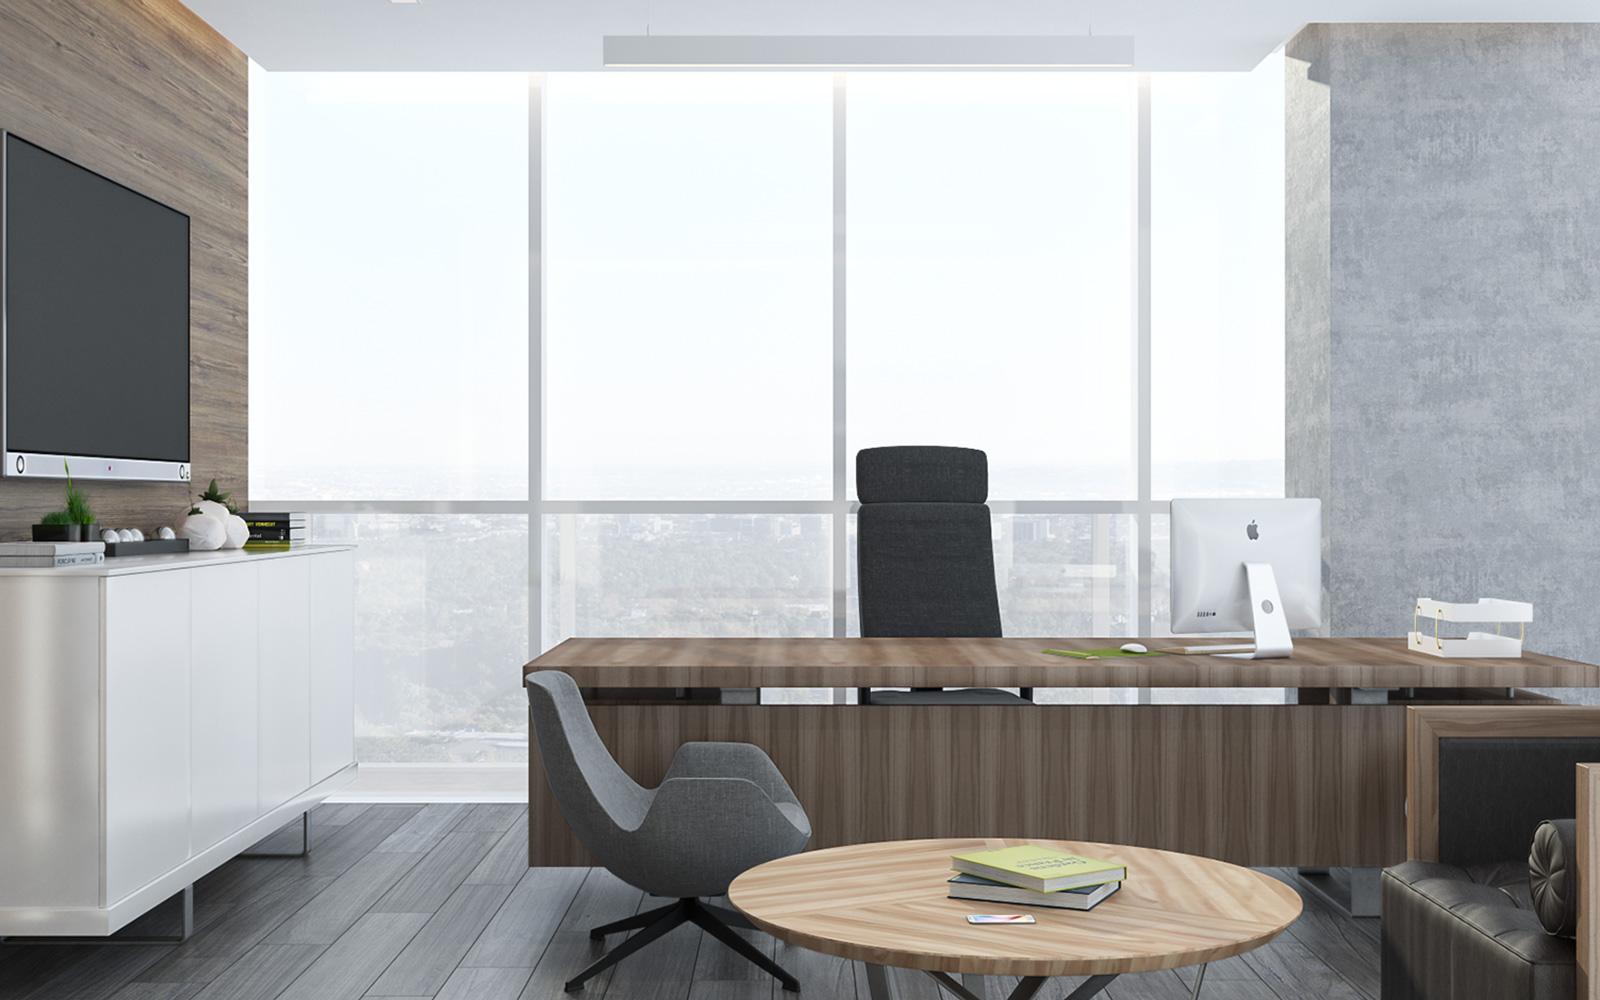 Vogue Design - Istanbul Eco Smart Office4